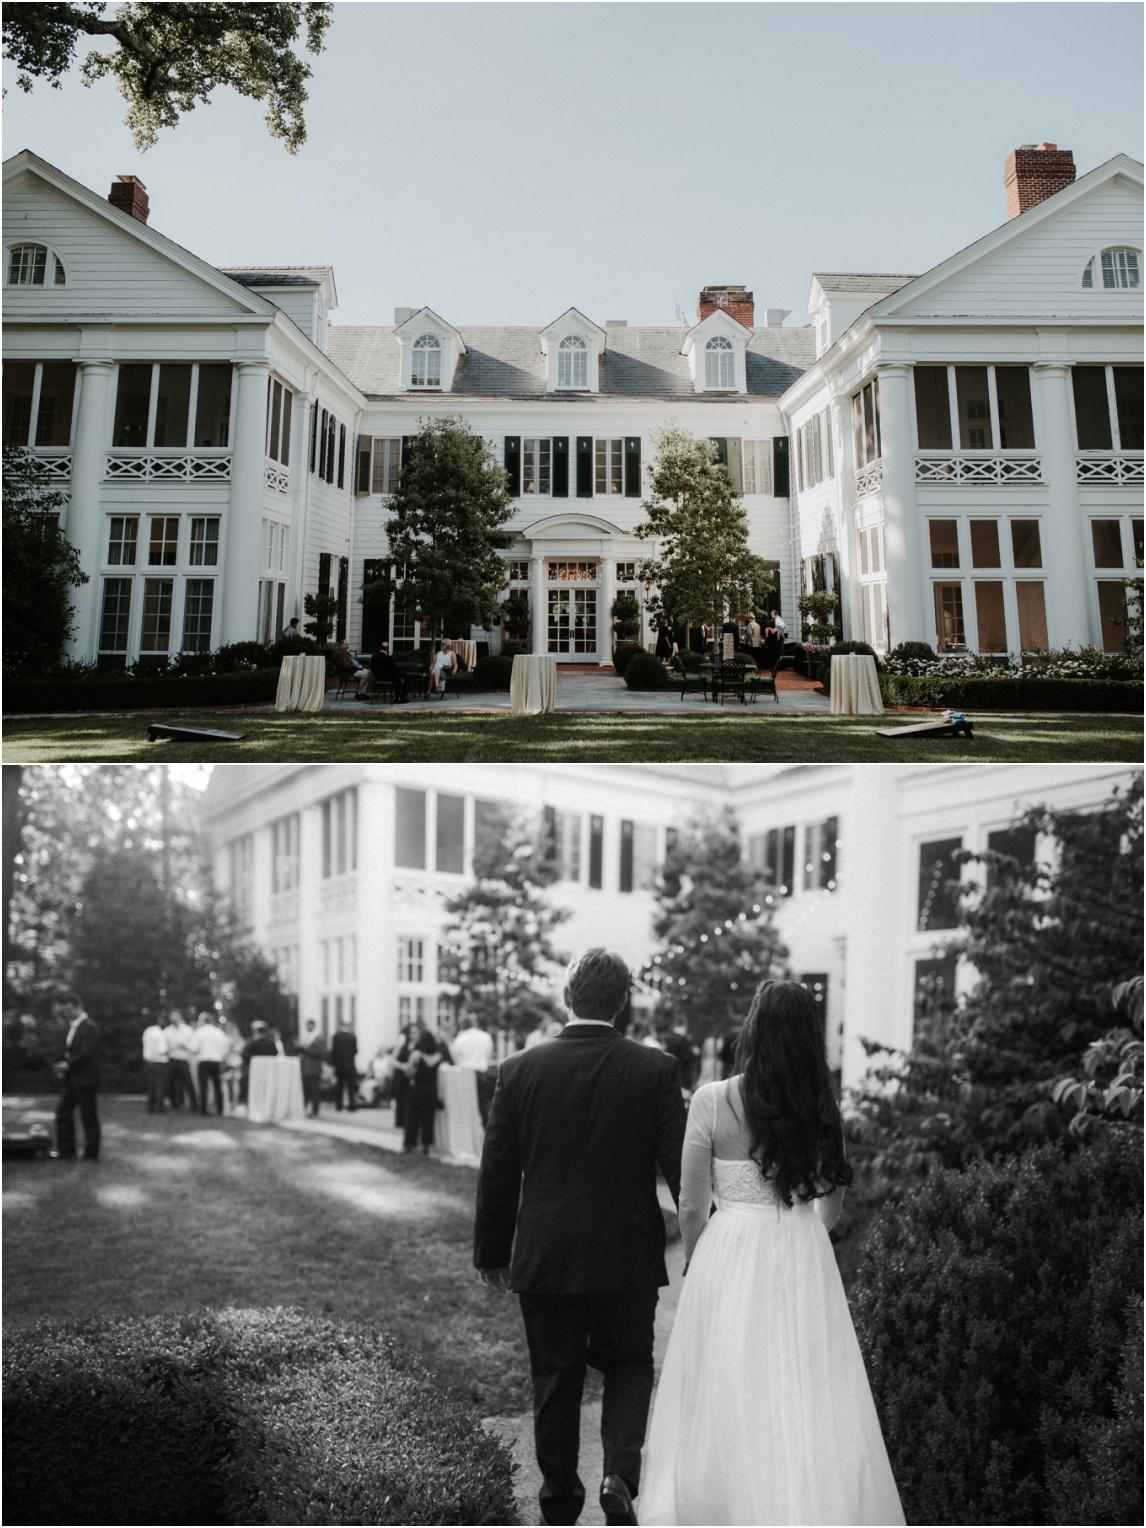 Posh-Moments-Photography-NC- Wedding-Photographer-Rolling-Hills-Farms-Wedding-Monroe-NC-Charlotte-NC_0206.jpg